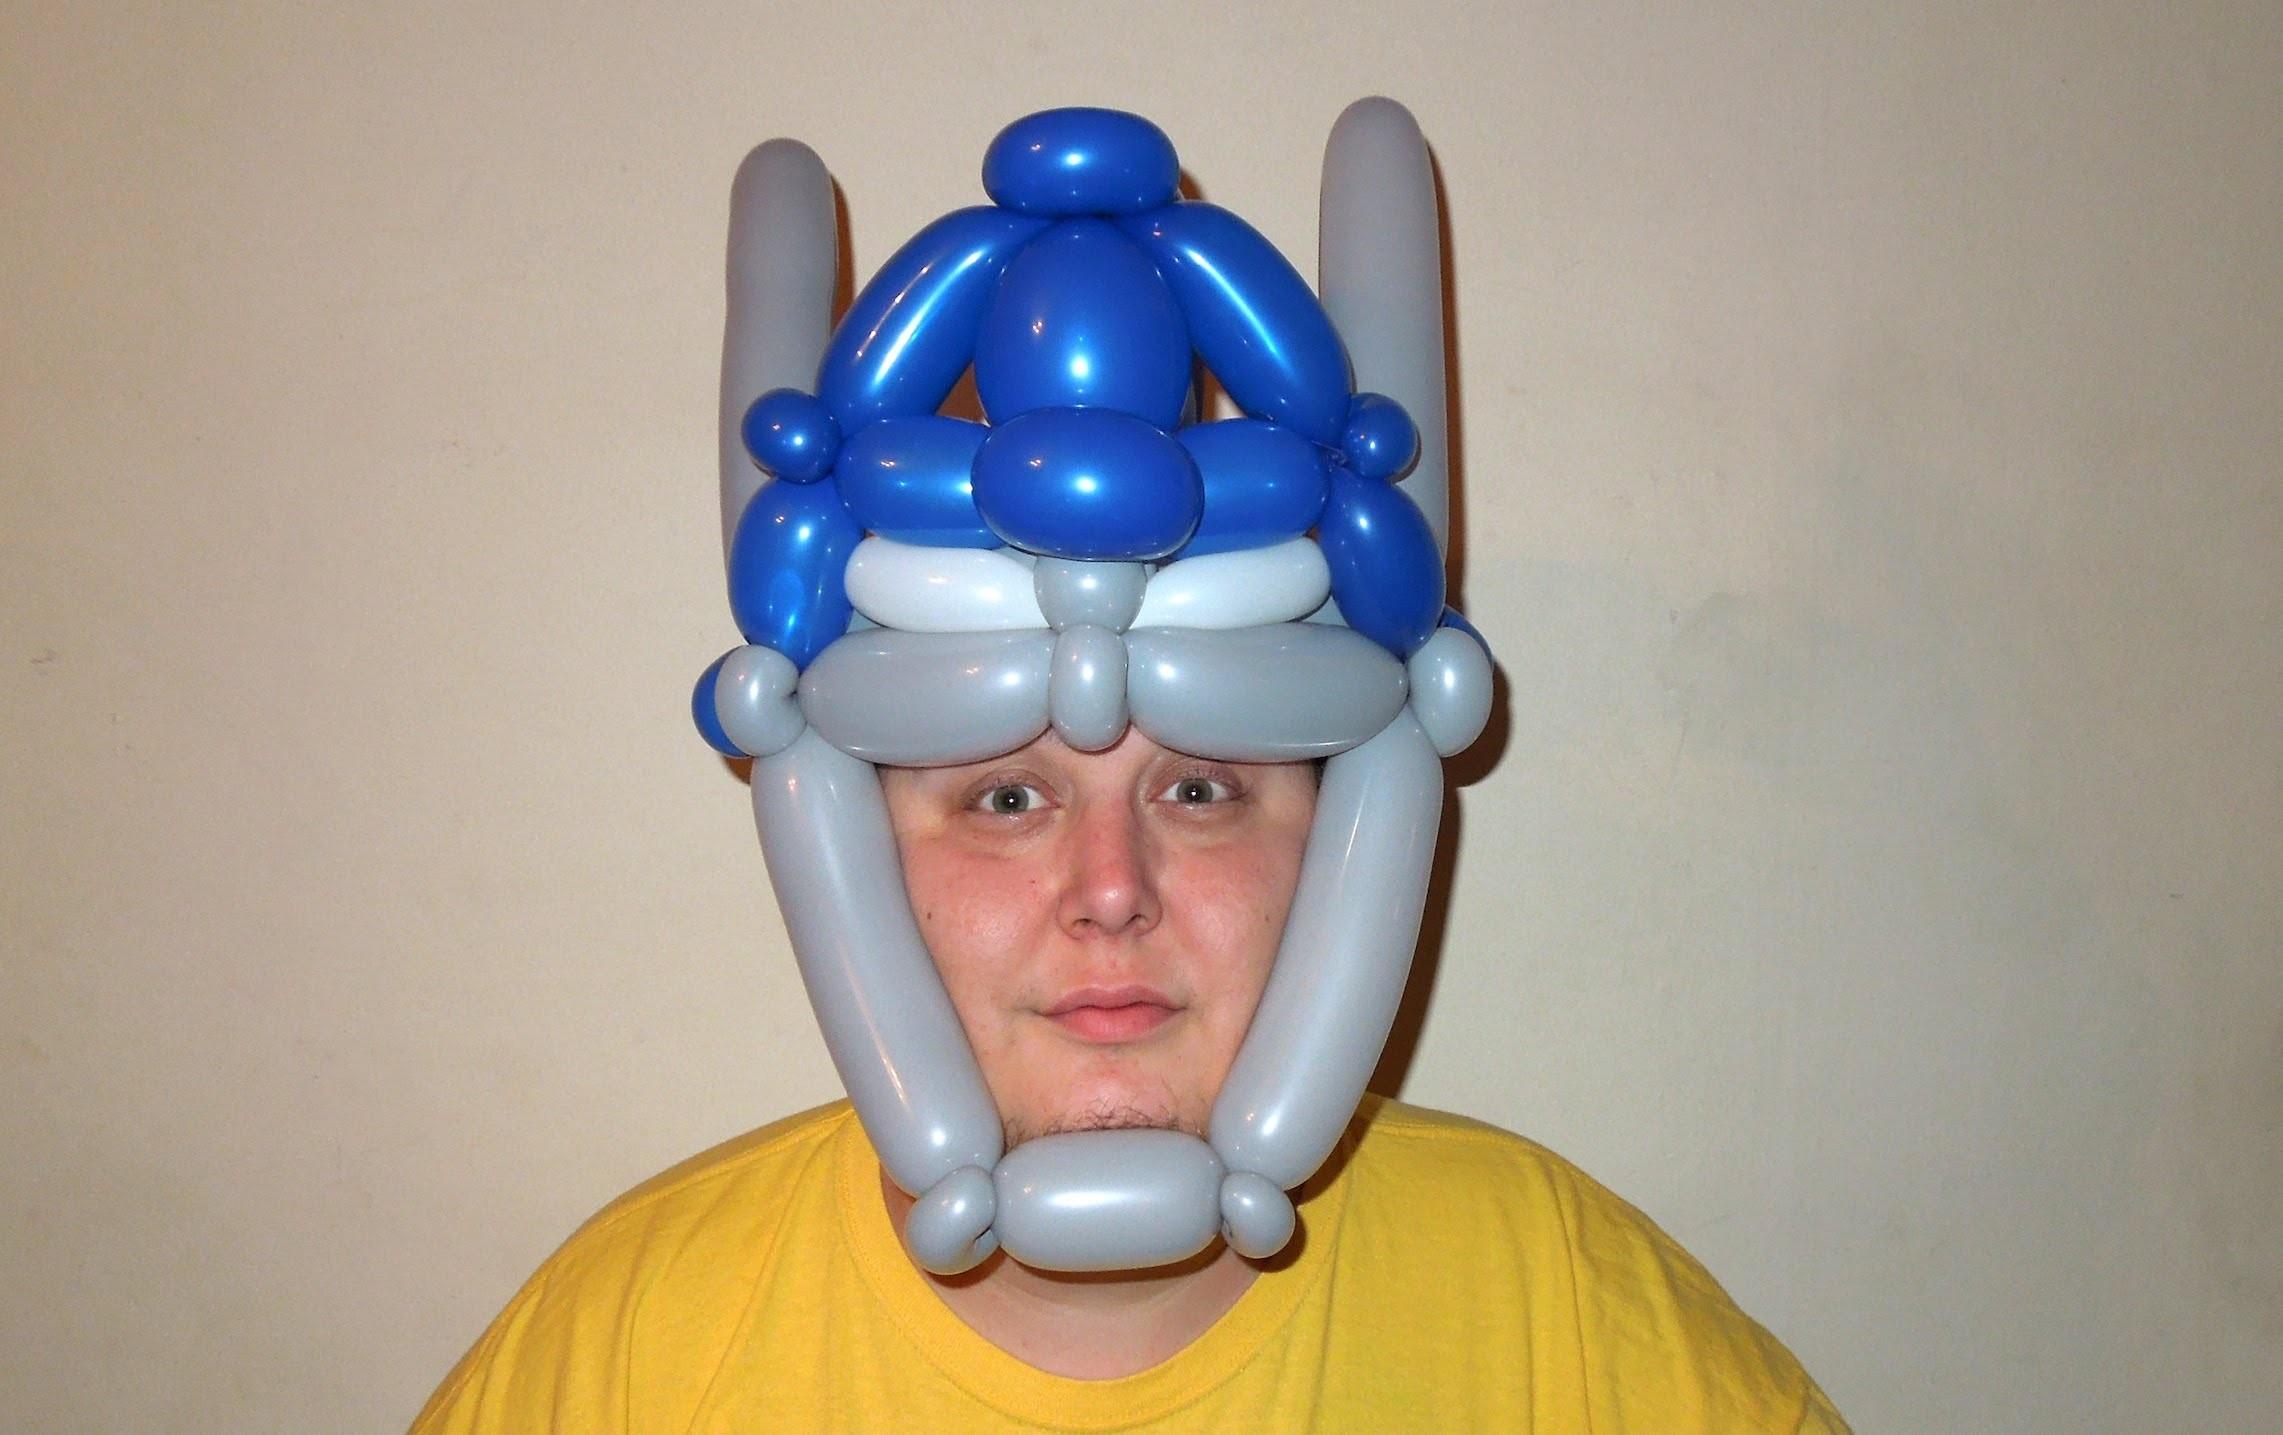 Transformers Optimus Prime Balloon Hat Chitwist Chicago Balloon